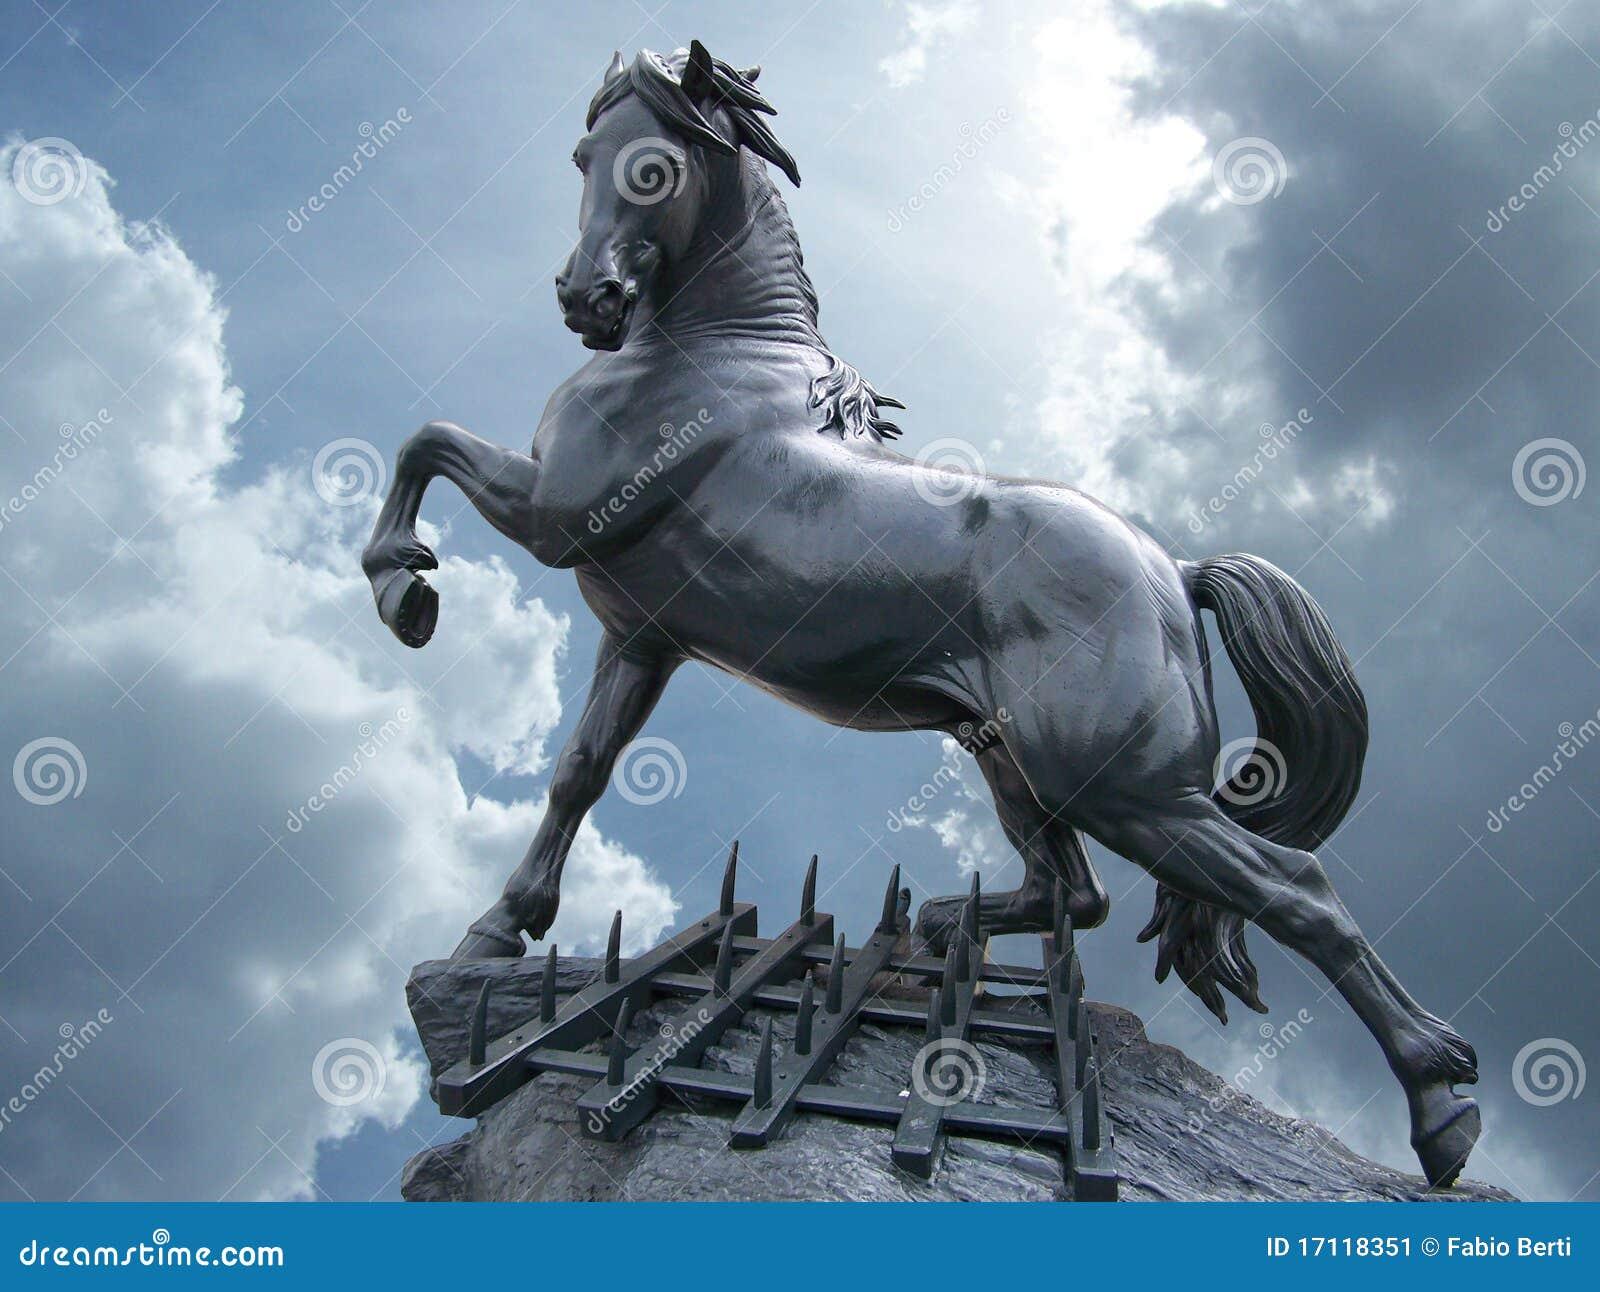 horse statue stock image